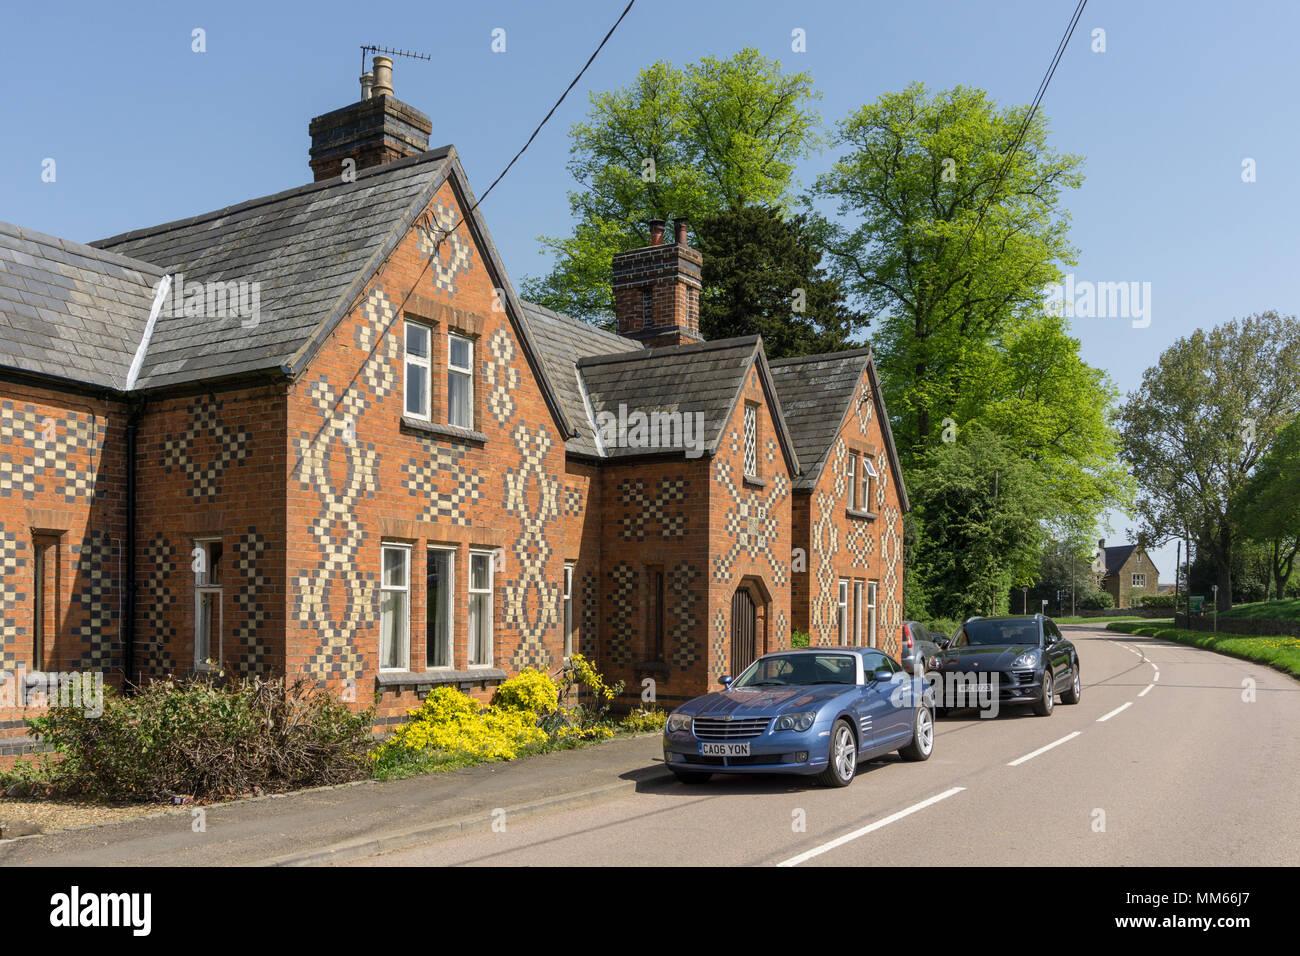 Häuser mit markanten Ziegel Muster an den Wänden; Lamport Dorf, Northamptonshire, Großbritannien Stockbild